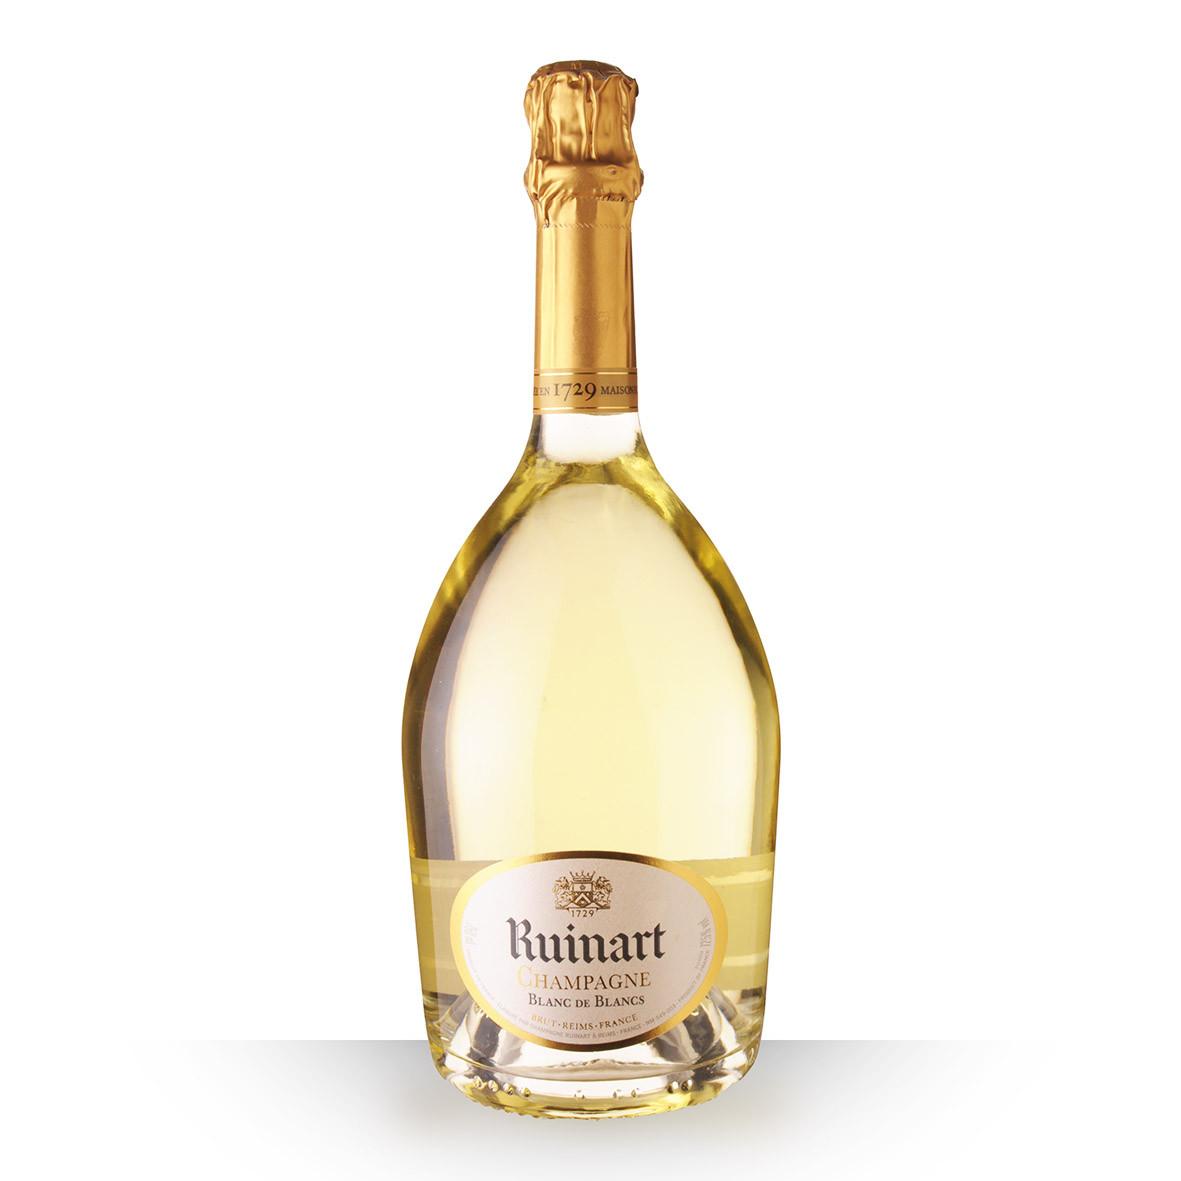 Champagne Ruinart Blanc de Blancs 75cl www.odyssee-vins.com